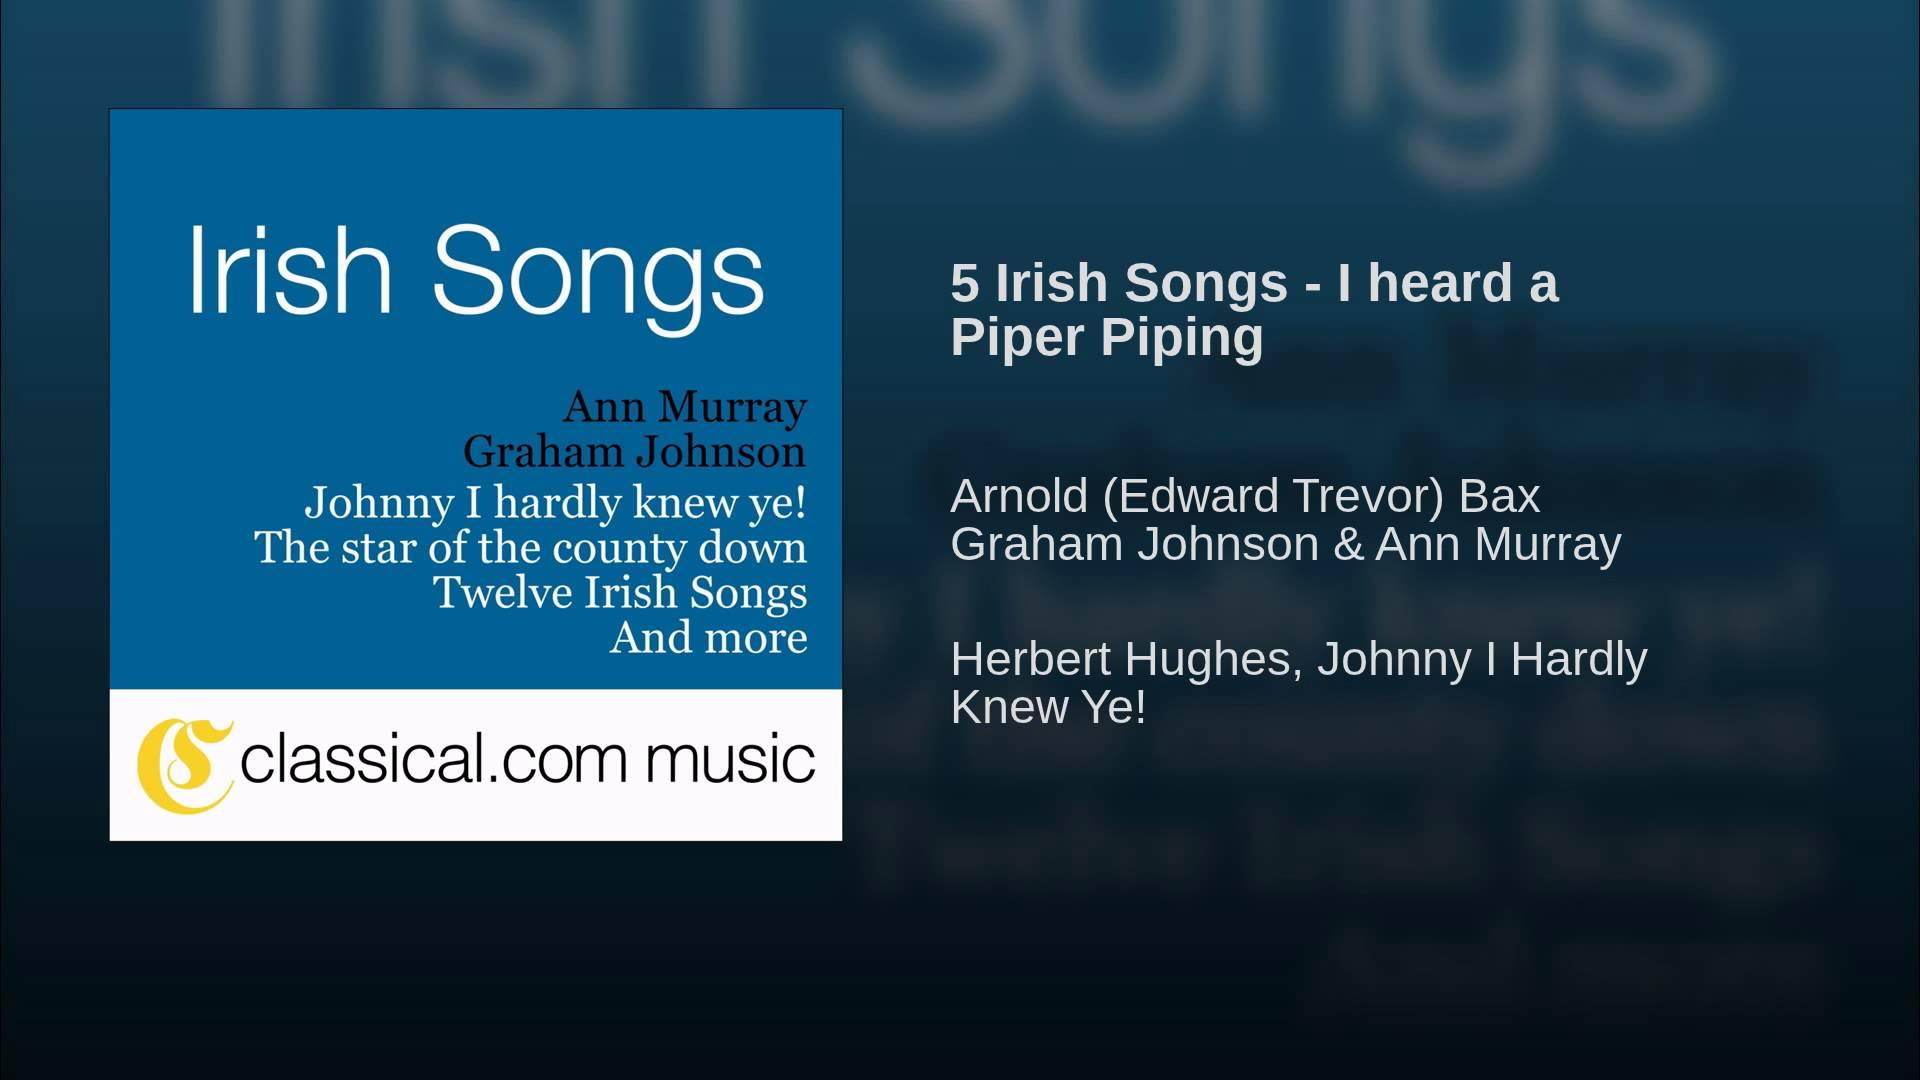 Arnold Bax: I heard a Piper Piping